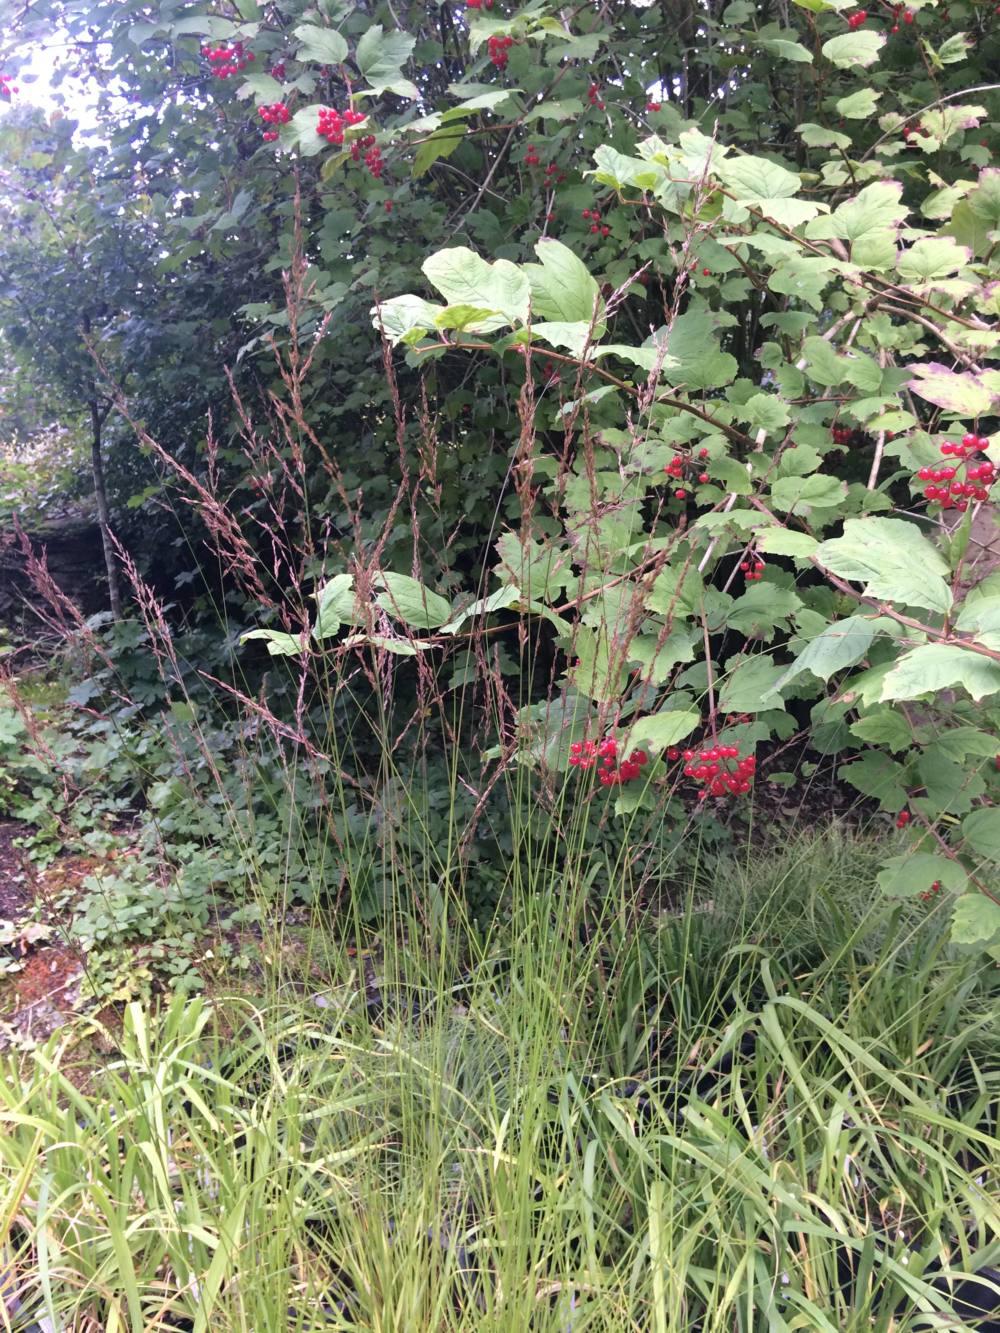 Penlan Perennials Nursery: Molinia Caerulea Subsp. Caerulea 'Edith Dudszus'